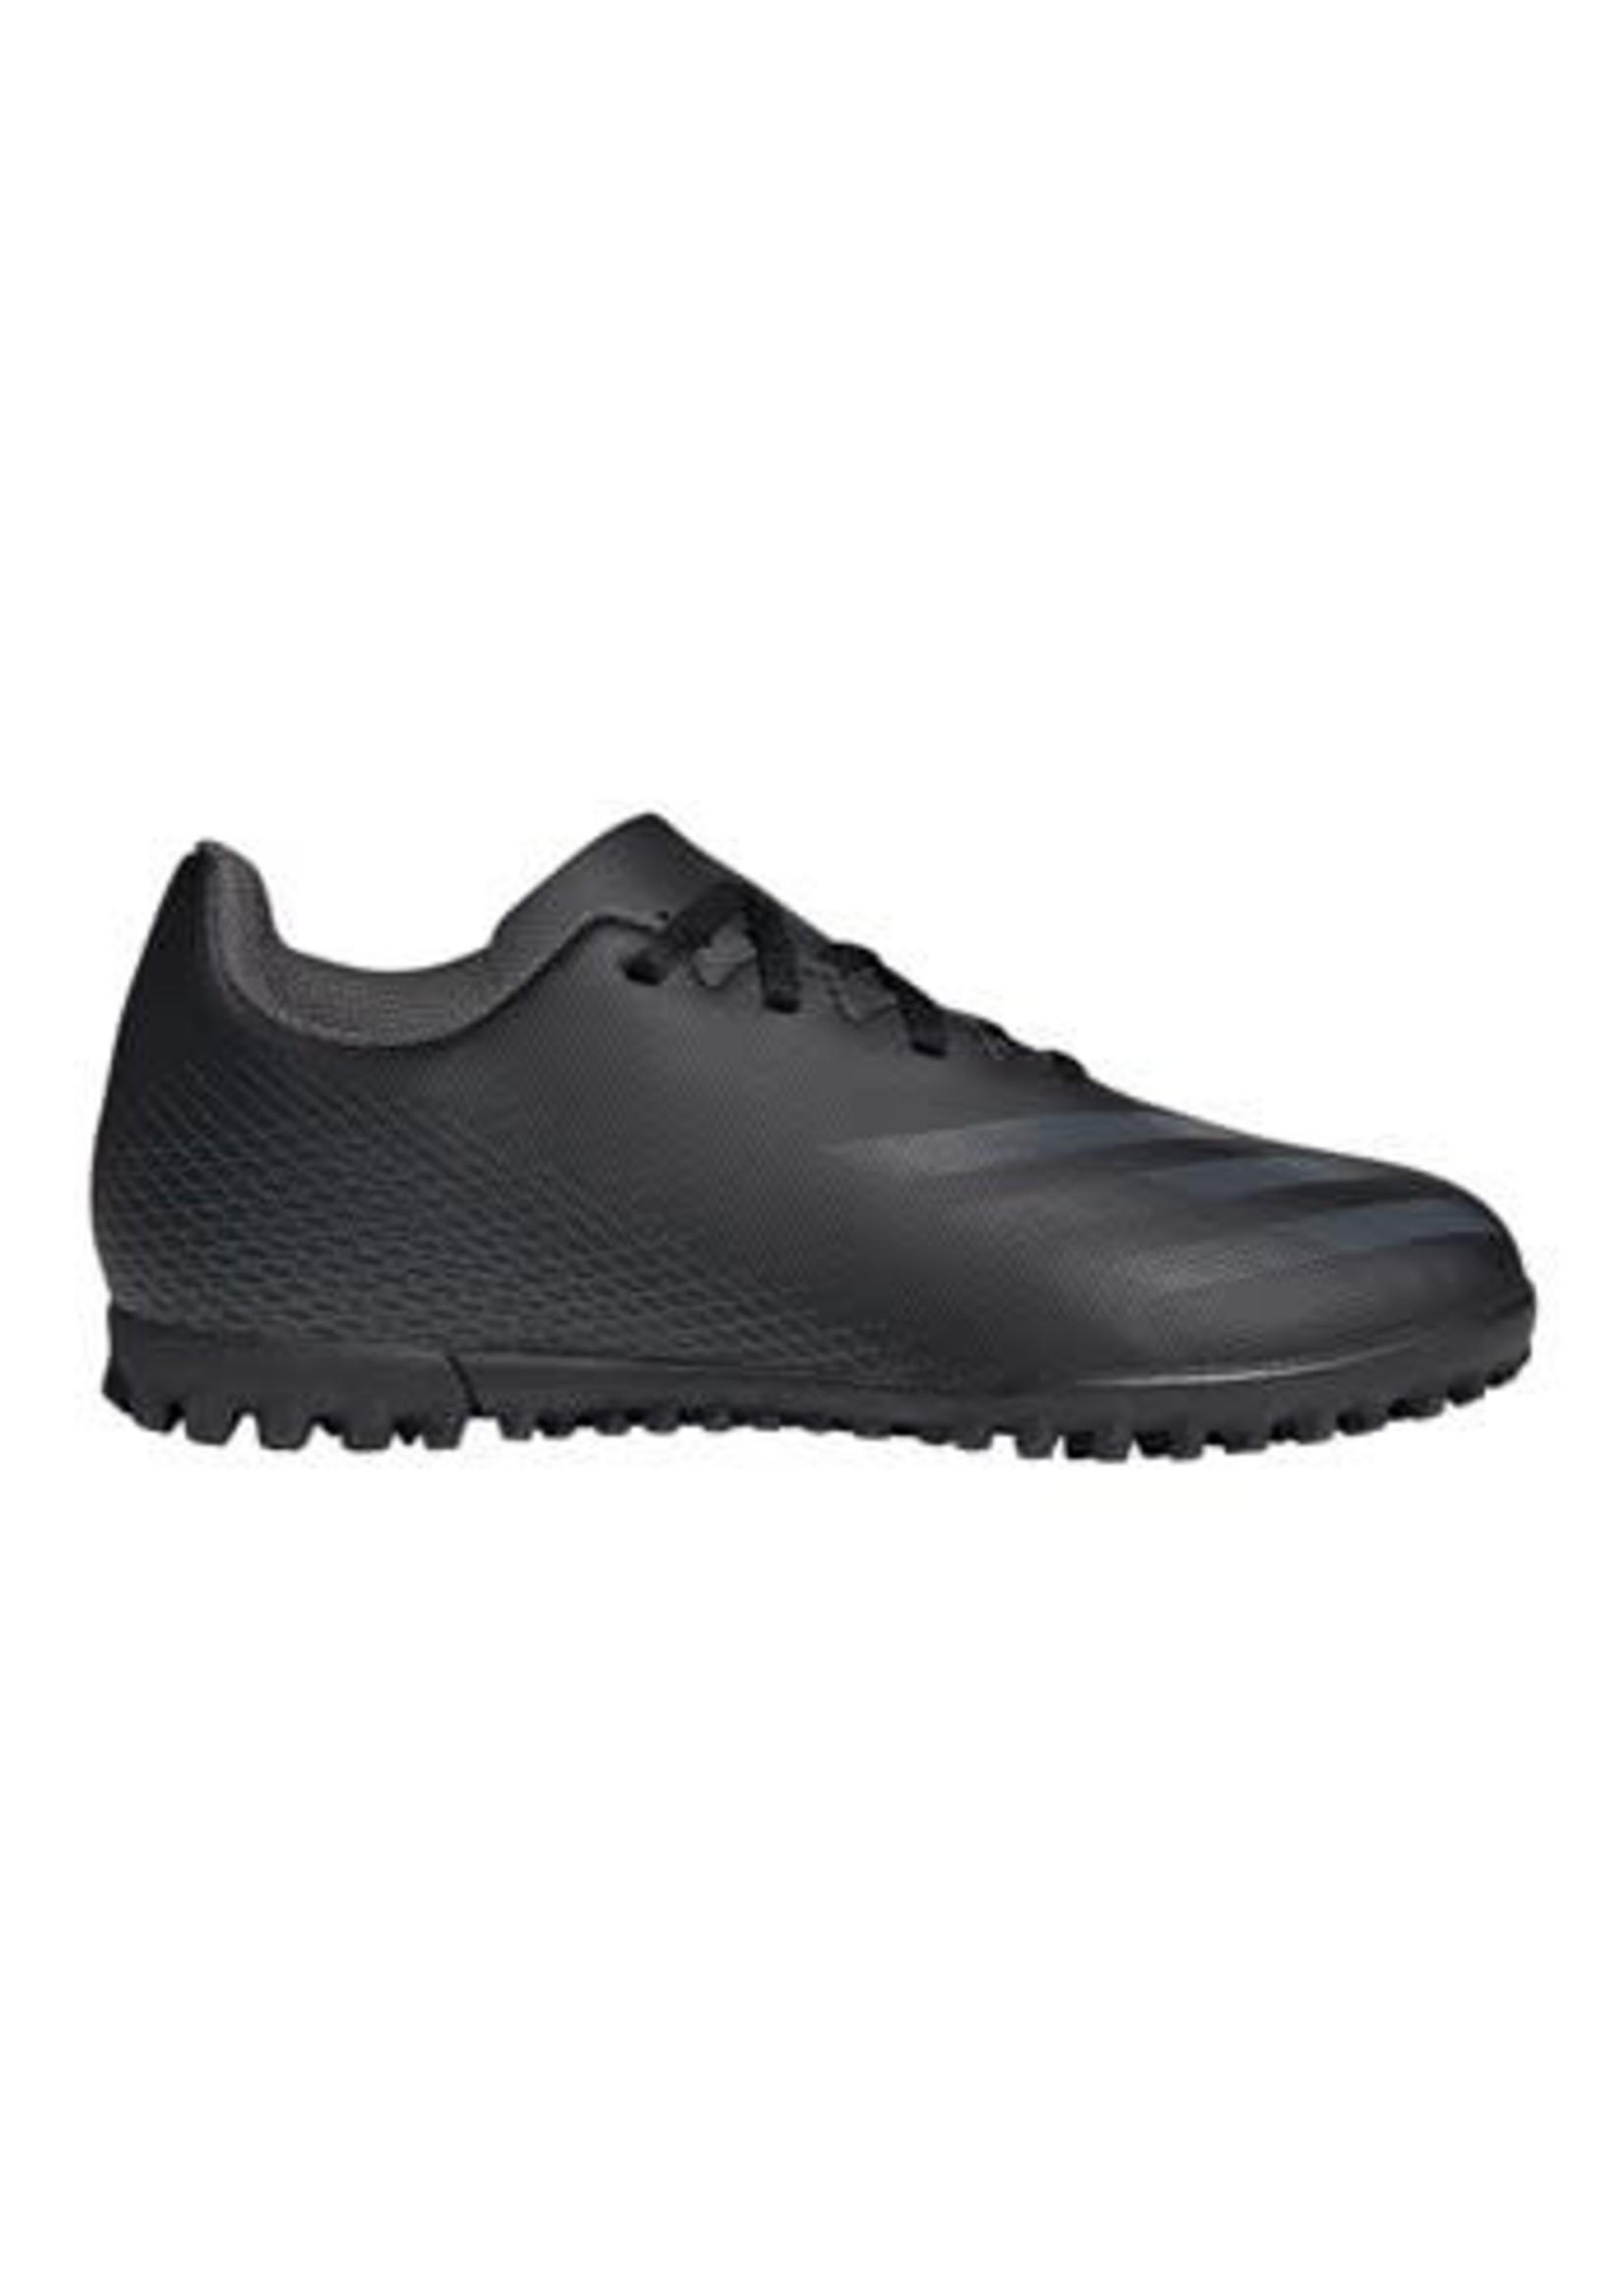 Adidas Adidas X Ghosted.4 Men Turf Shoe (2021) - Black